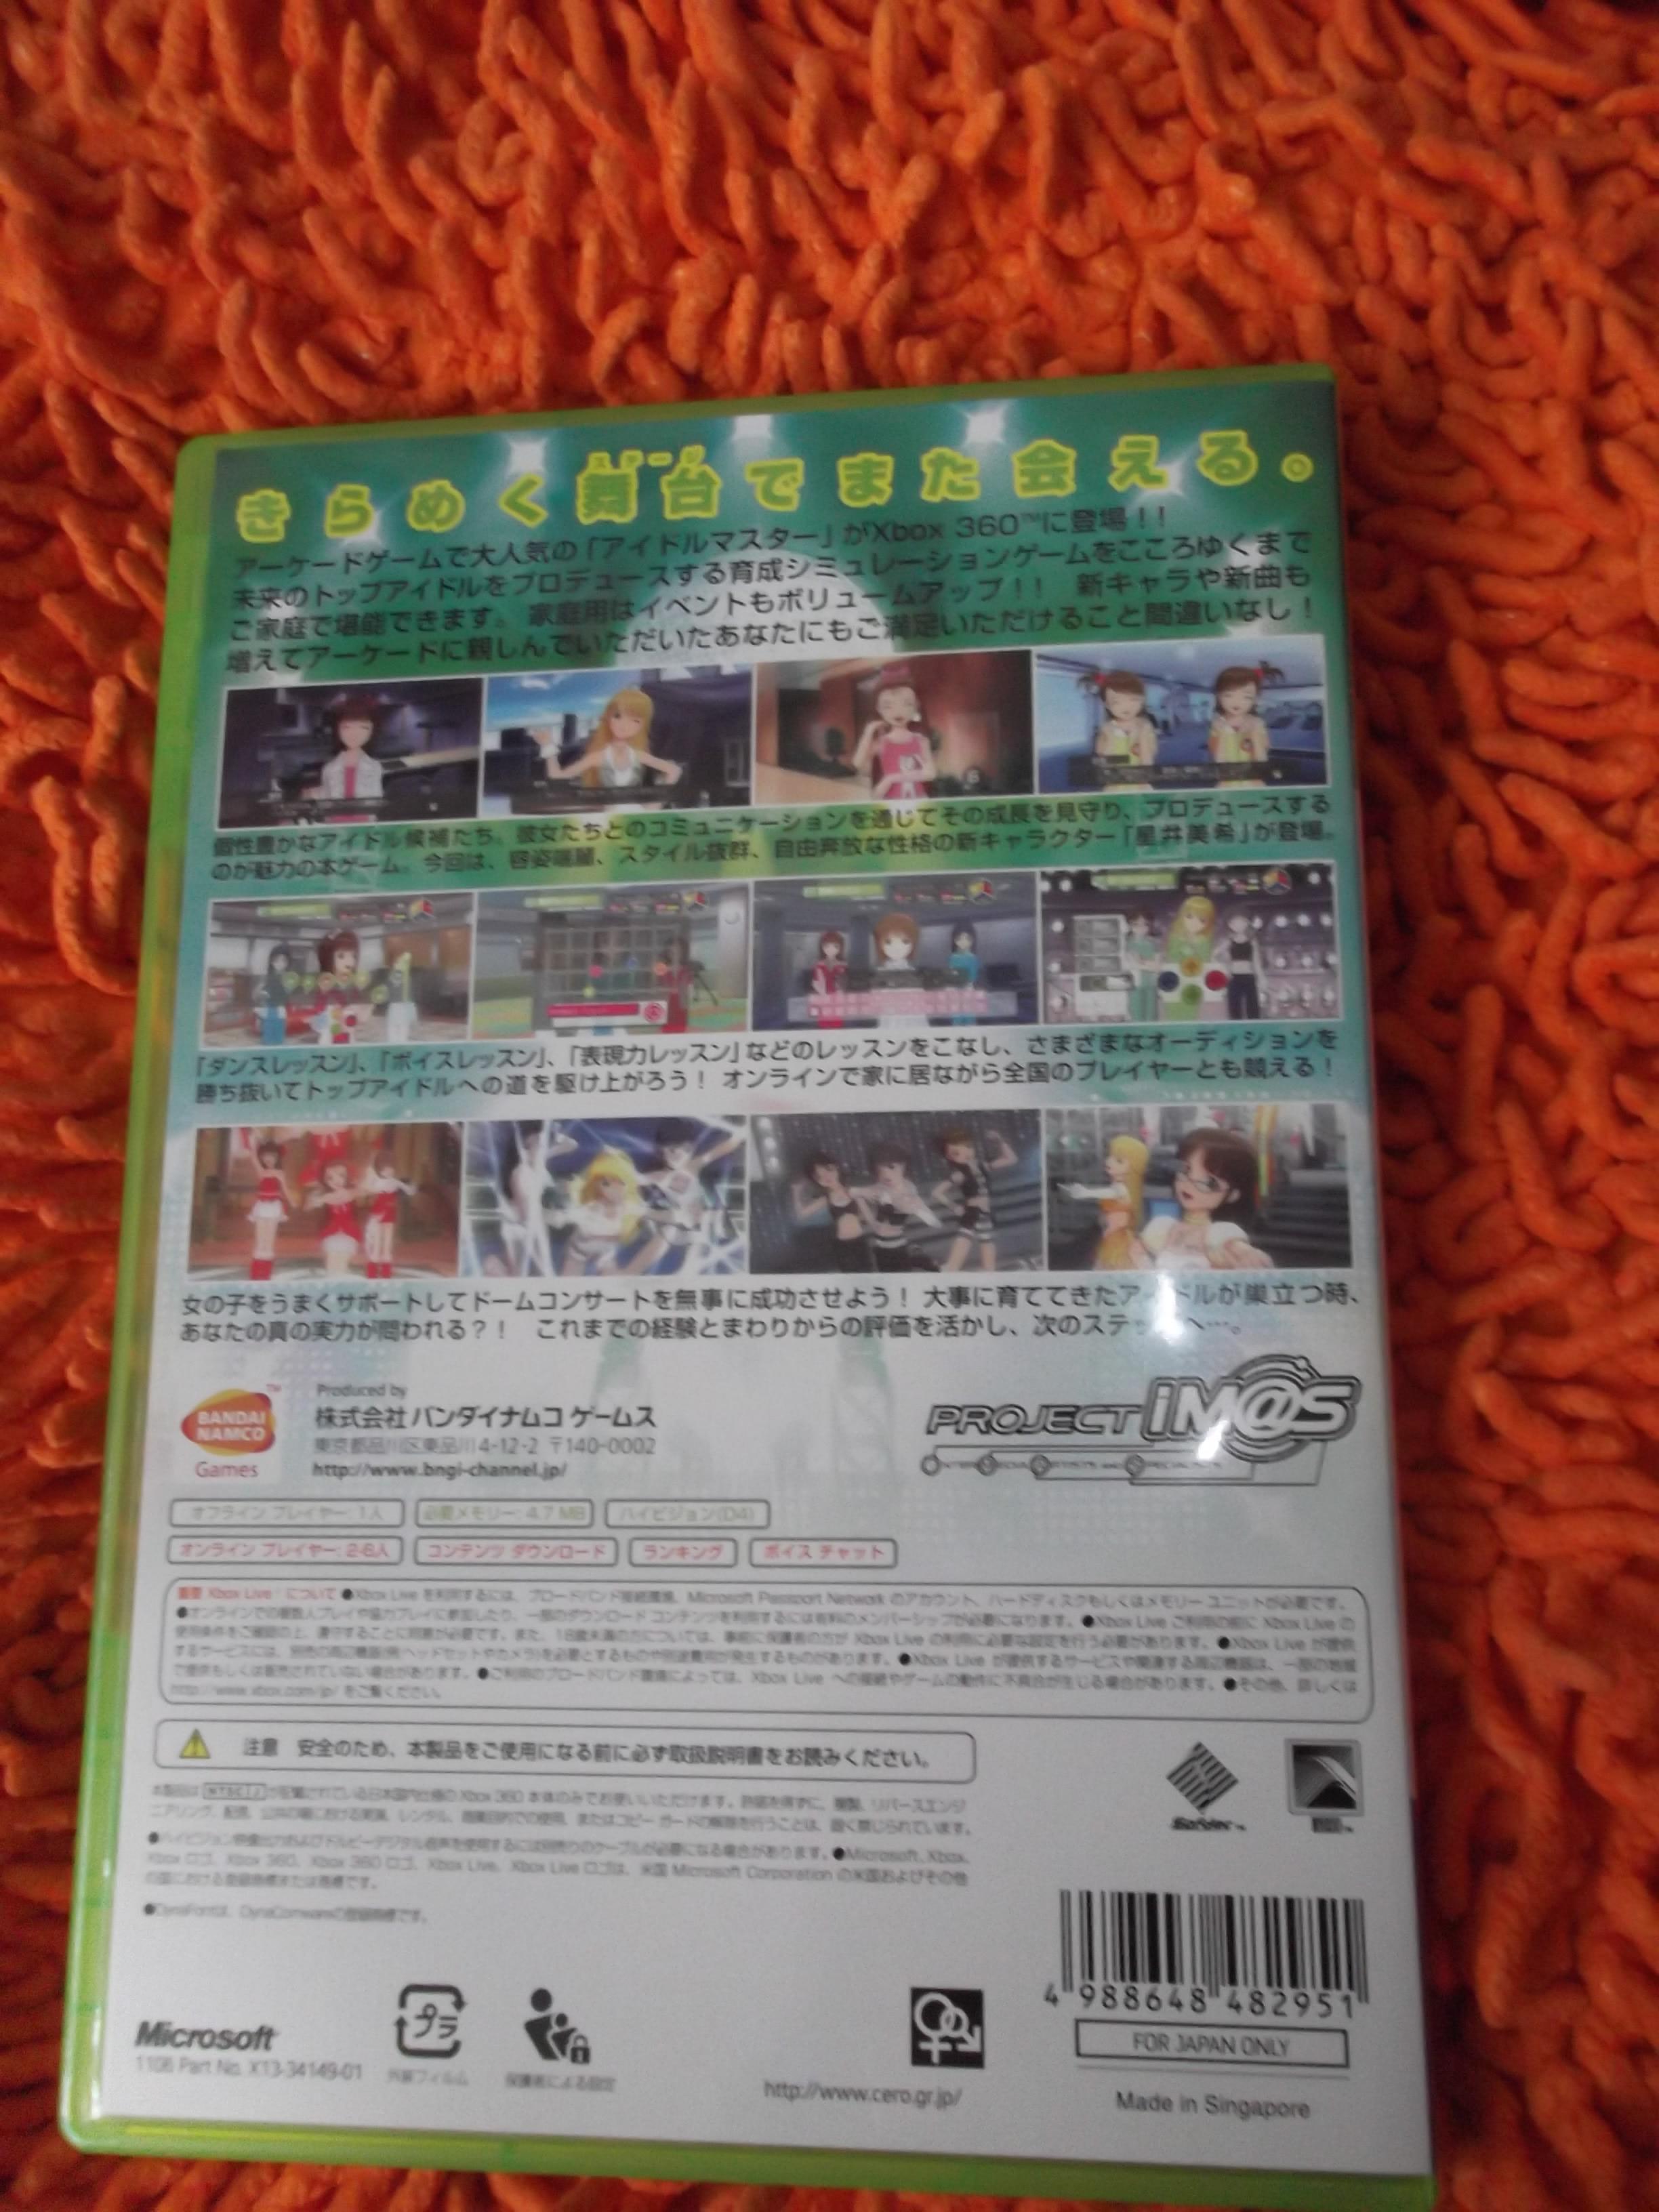 namco visual_novel the_idolmaster xbox_360_game